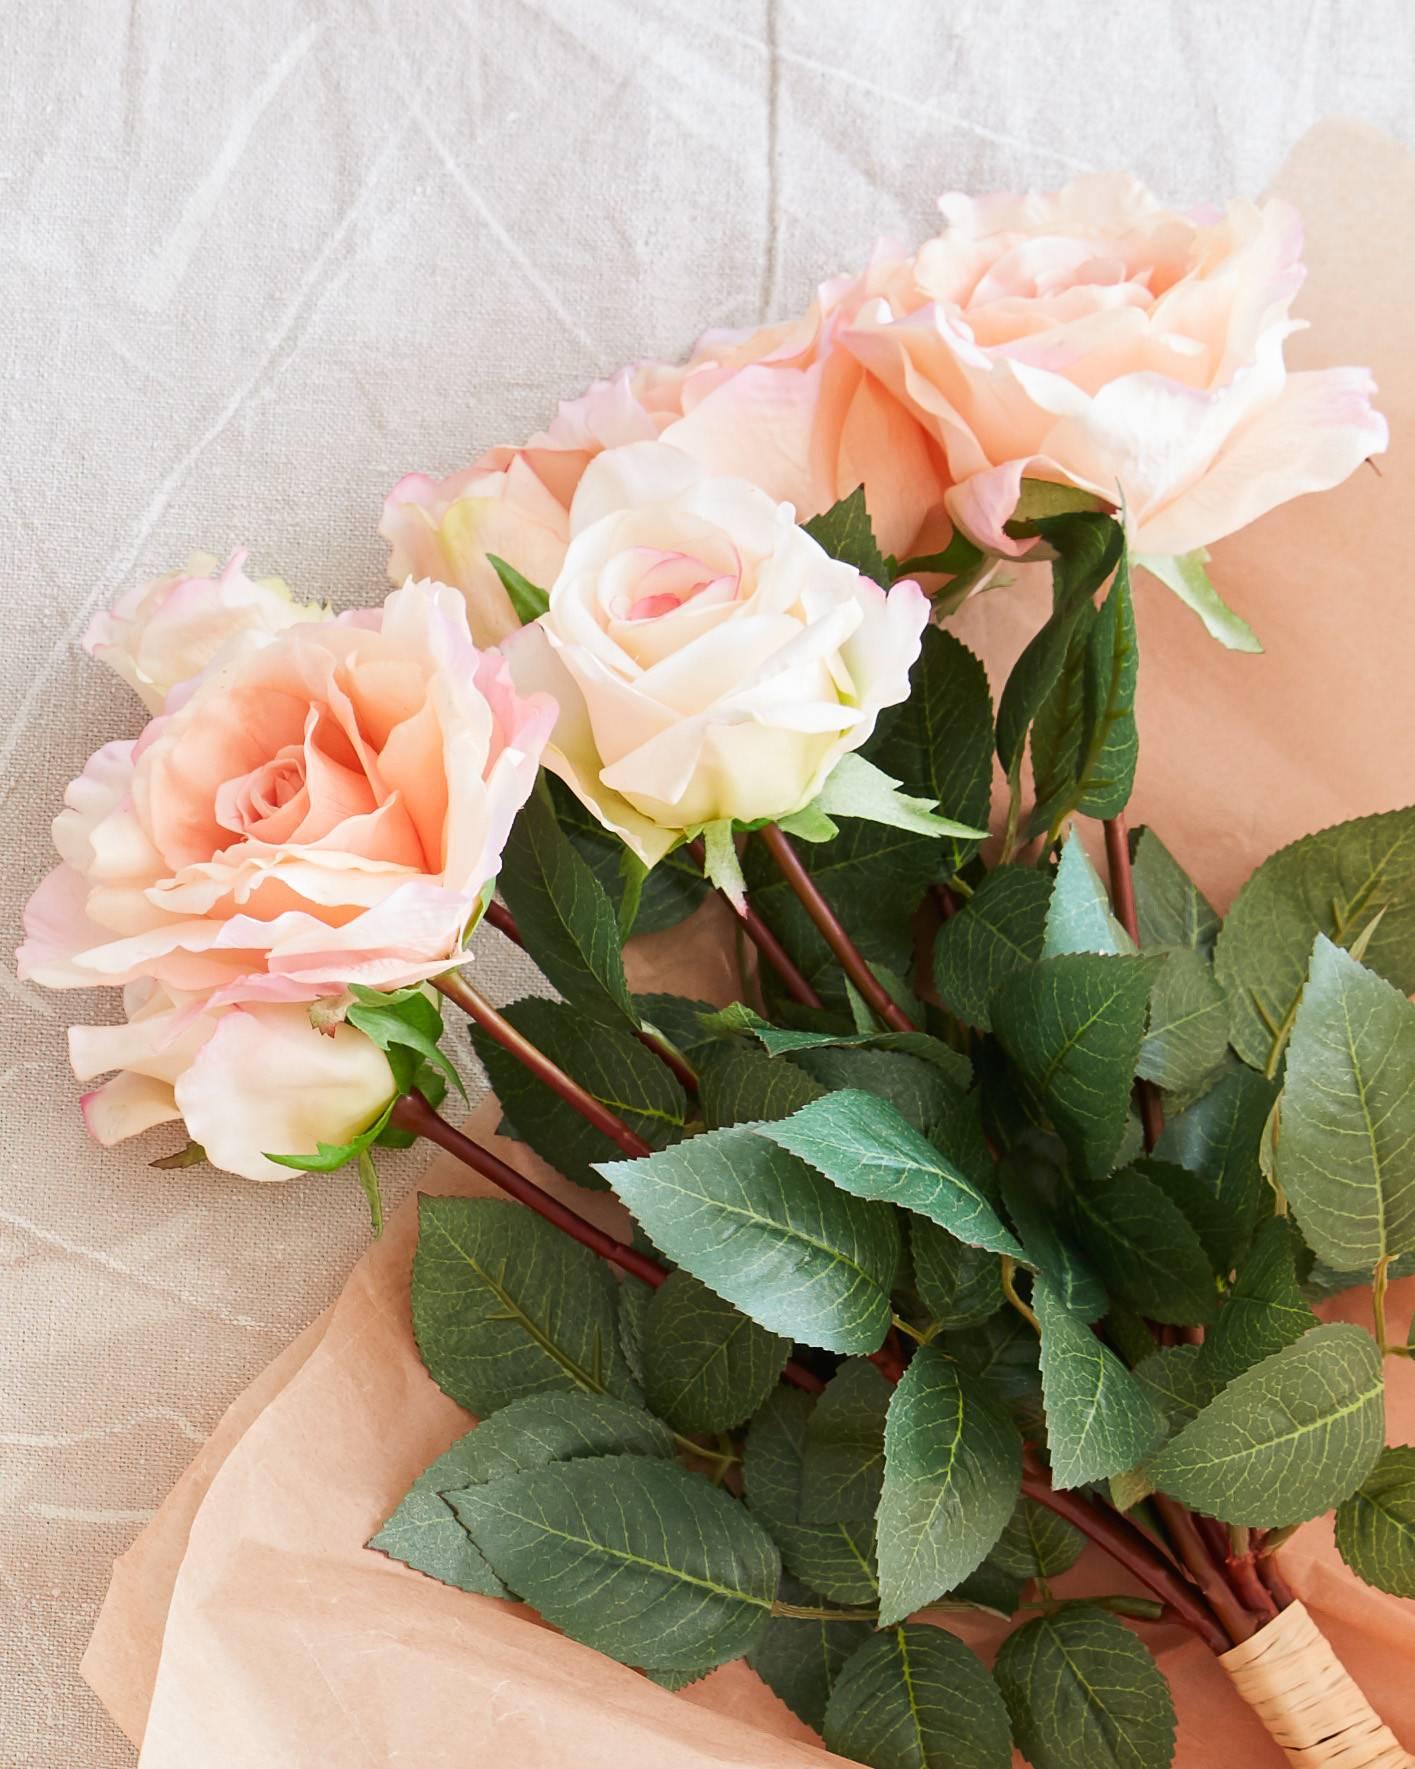 Rose flower stems balsam hill rose flower stems by balsam hill izmirmasajfo